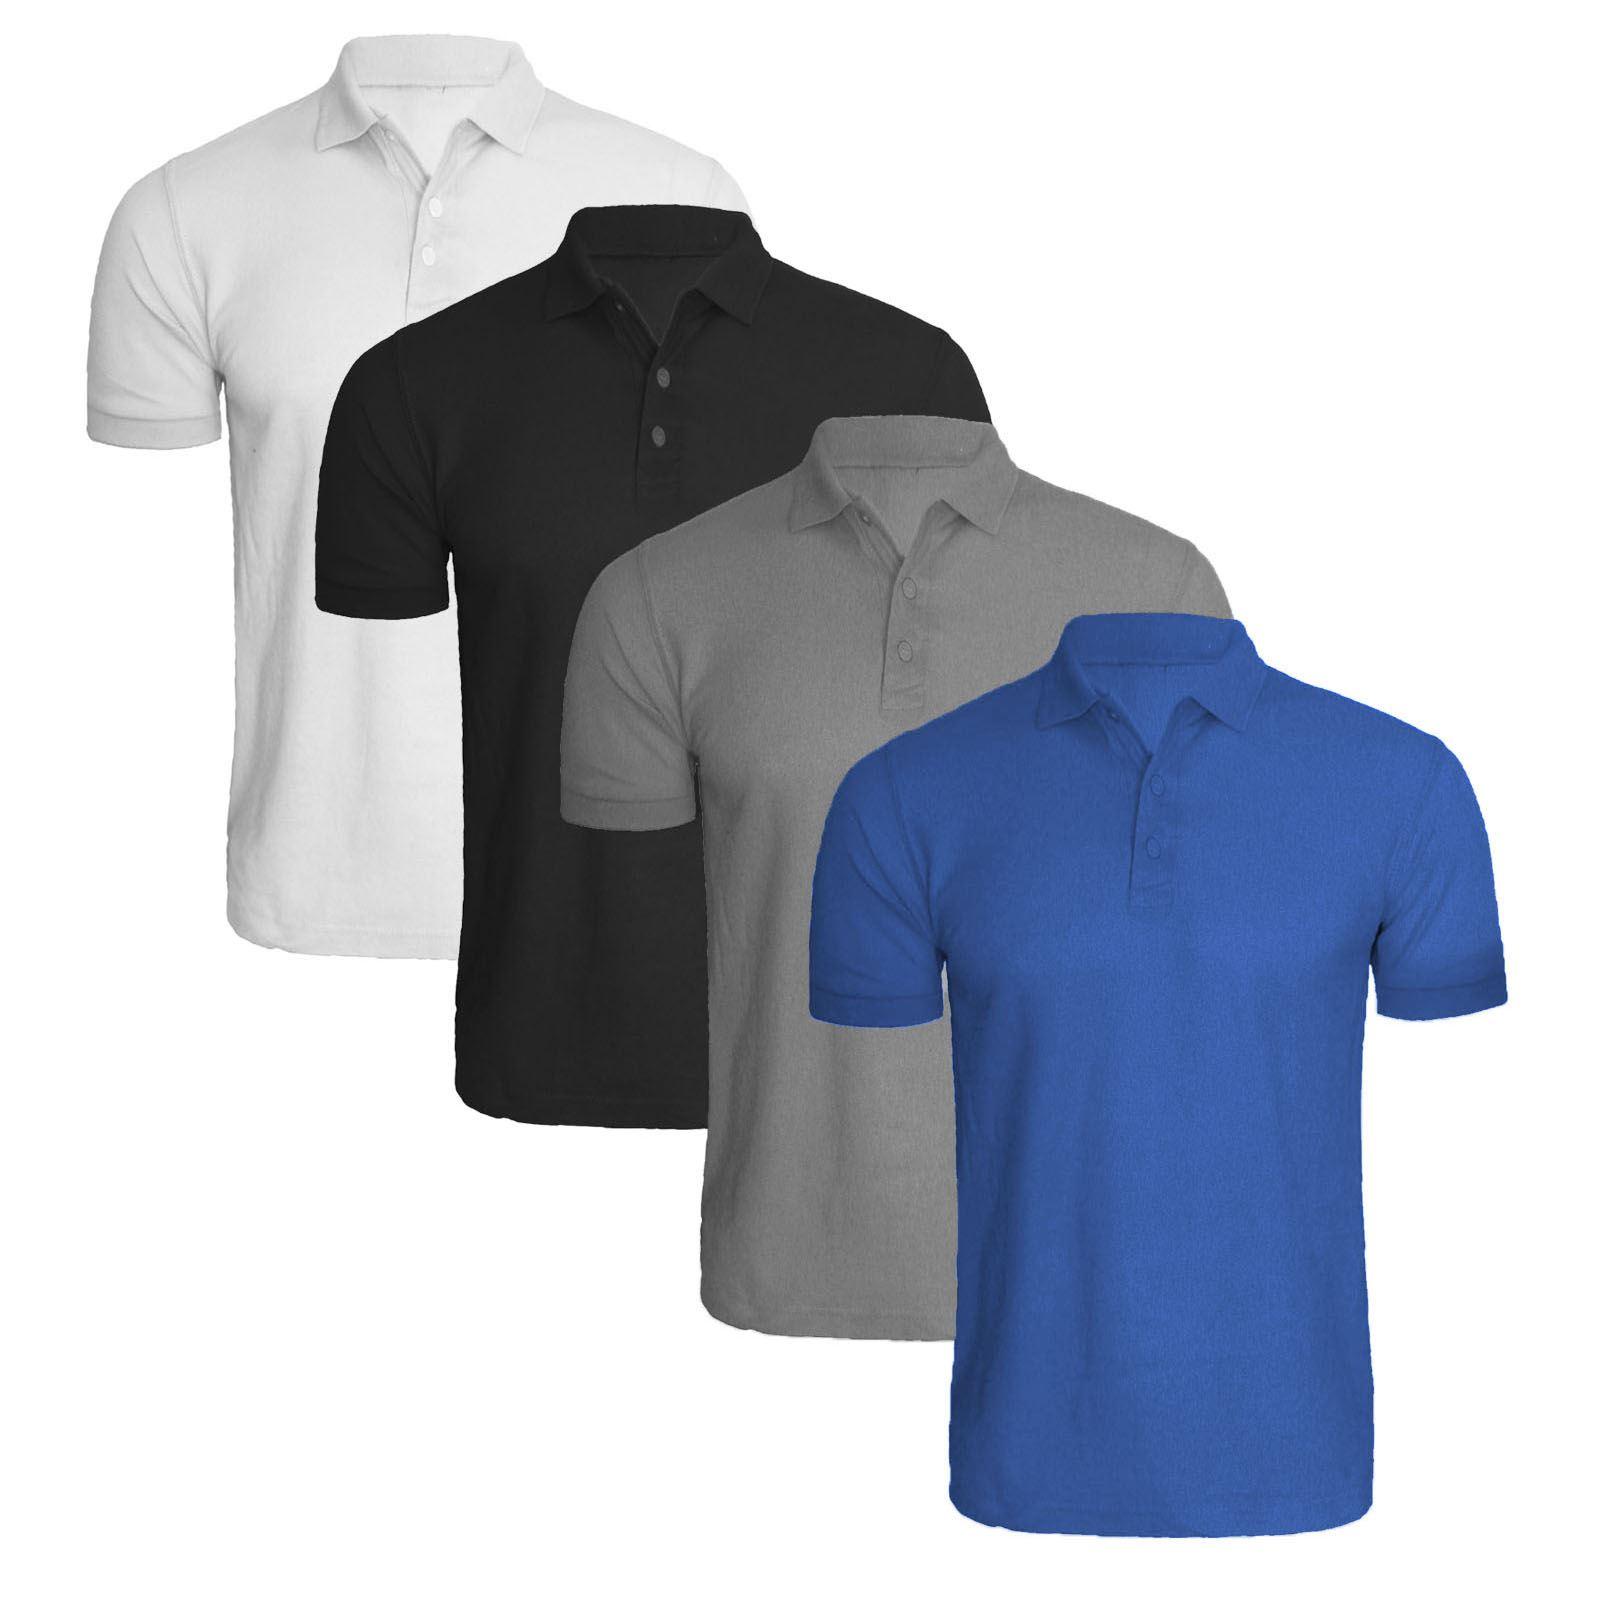 4 pack plain polo shirt t shirt golf tennis pique top many for Plain t shirt pack